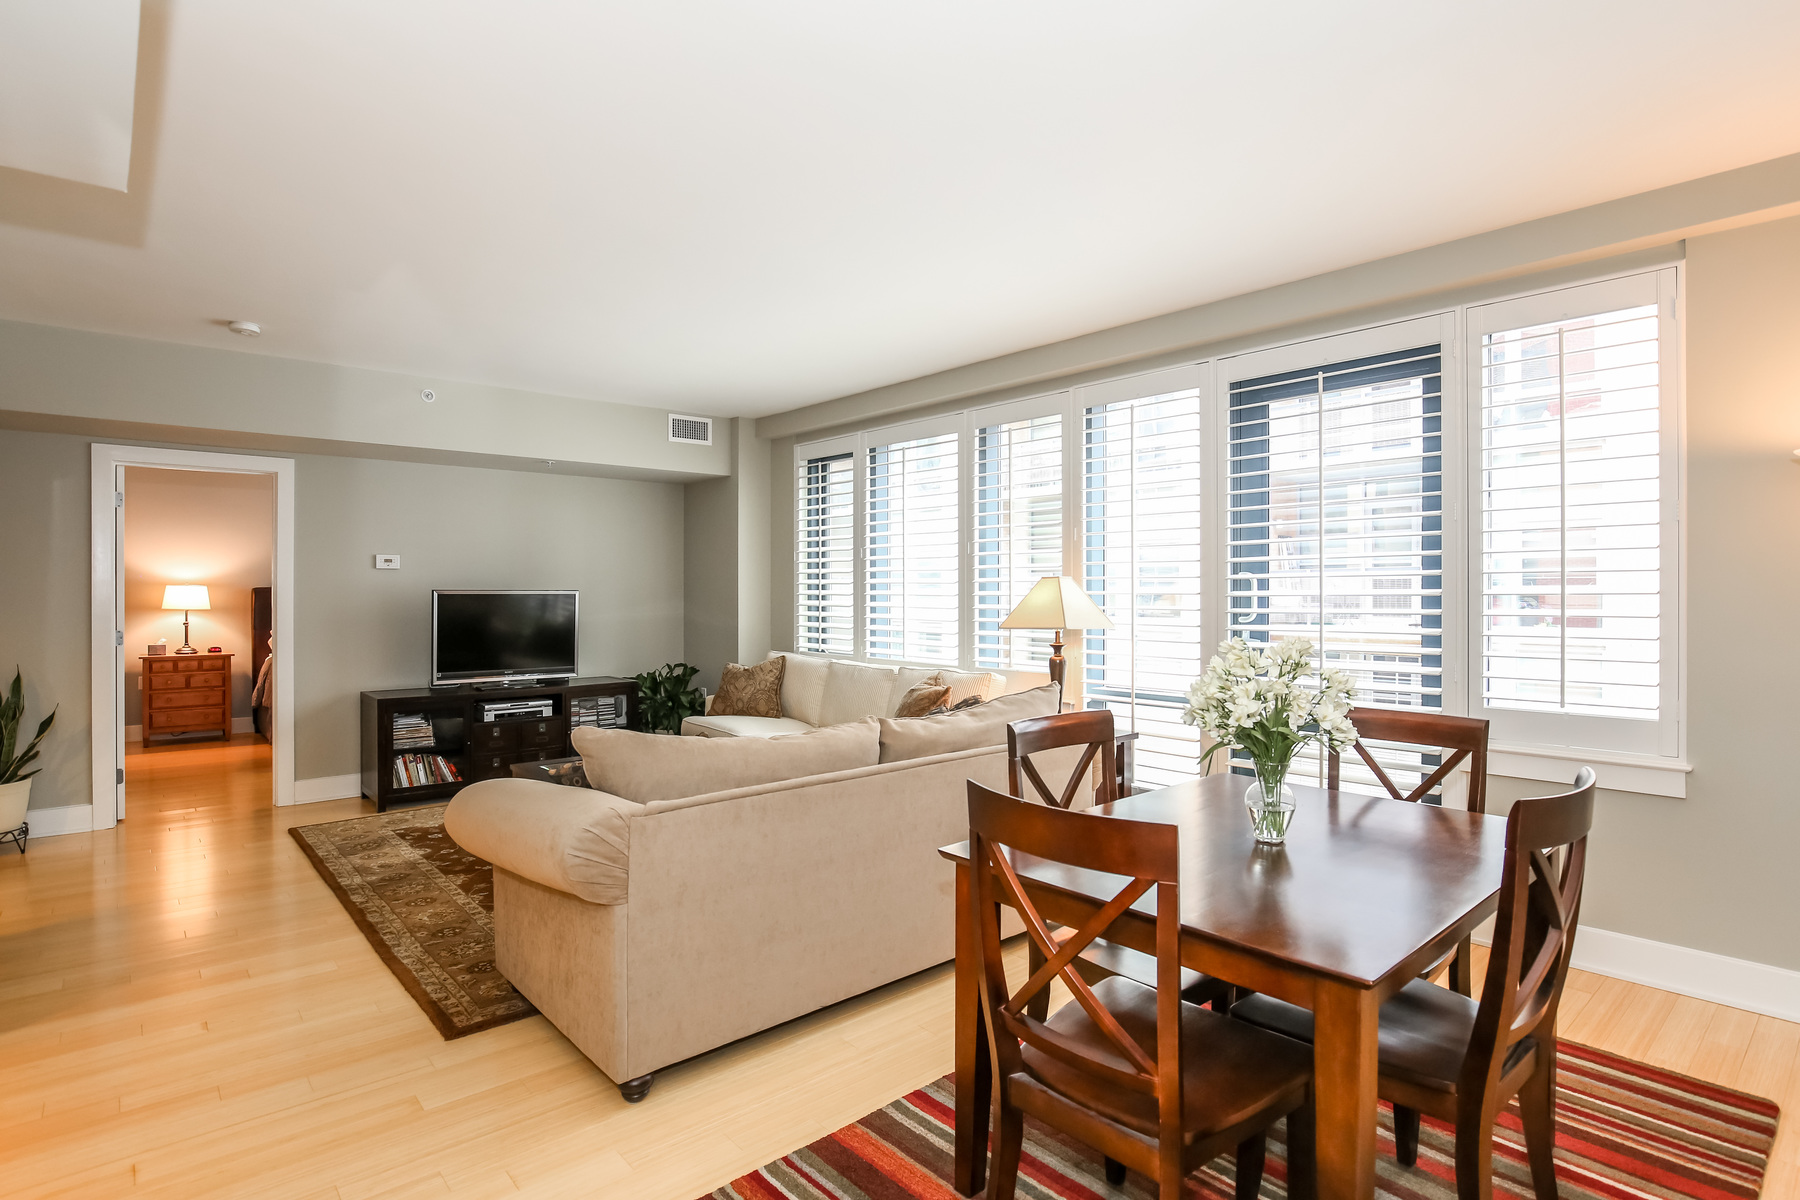 Condominium for Sale at 1450 Church Street Nw 301, Washington Washington, District Of Columbia 20005 United States